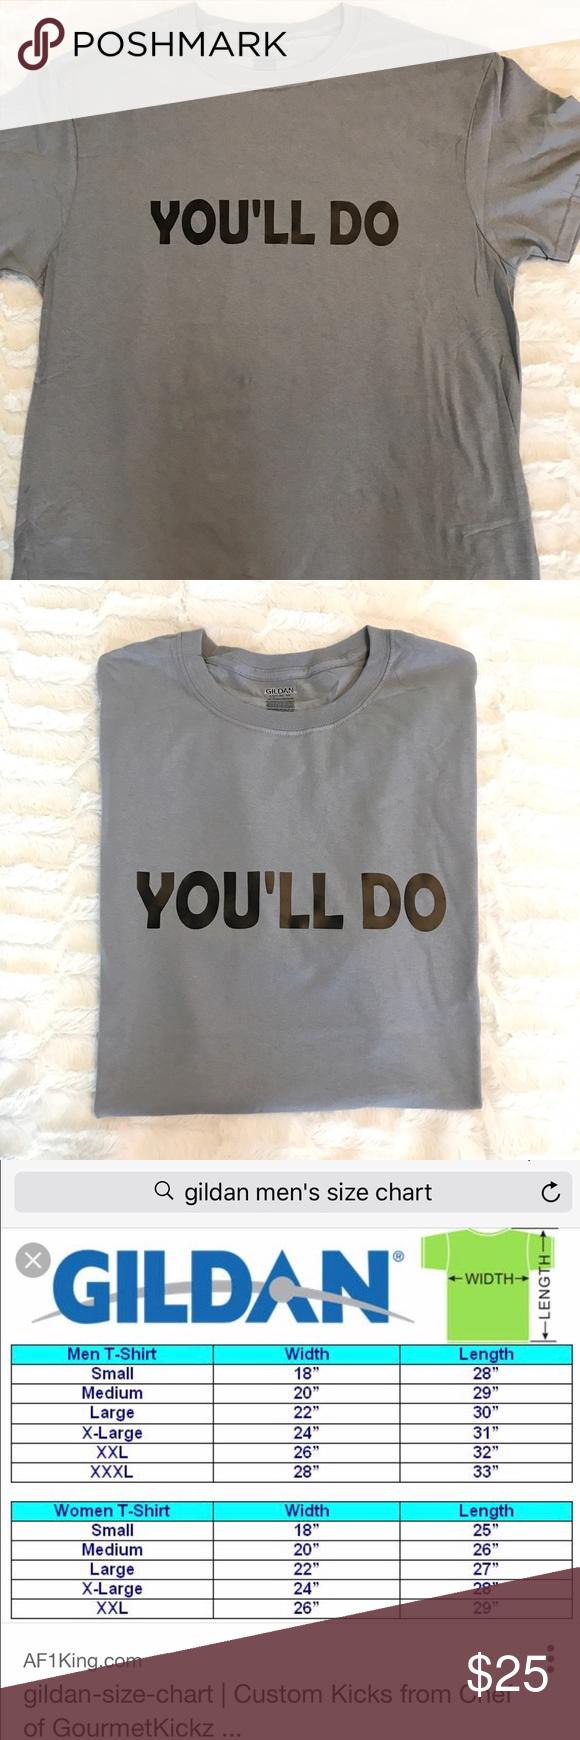 Gildan Shirts Sizes